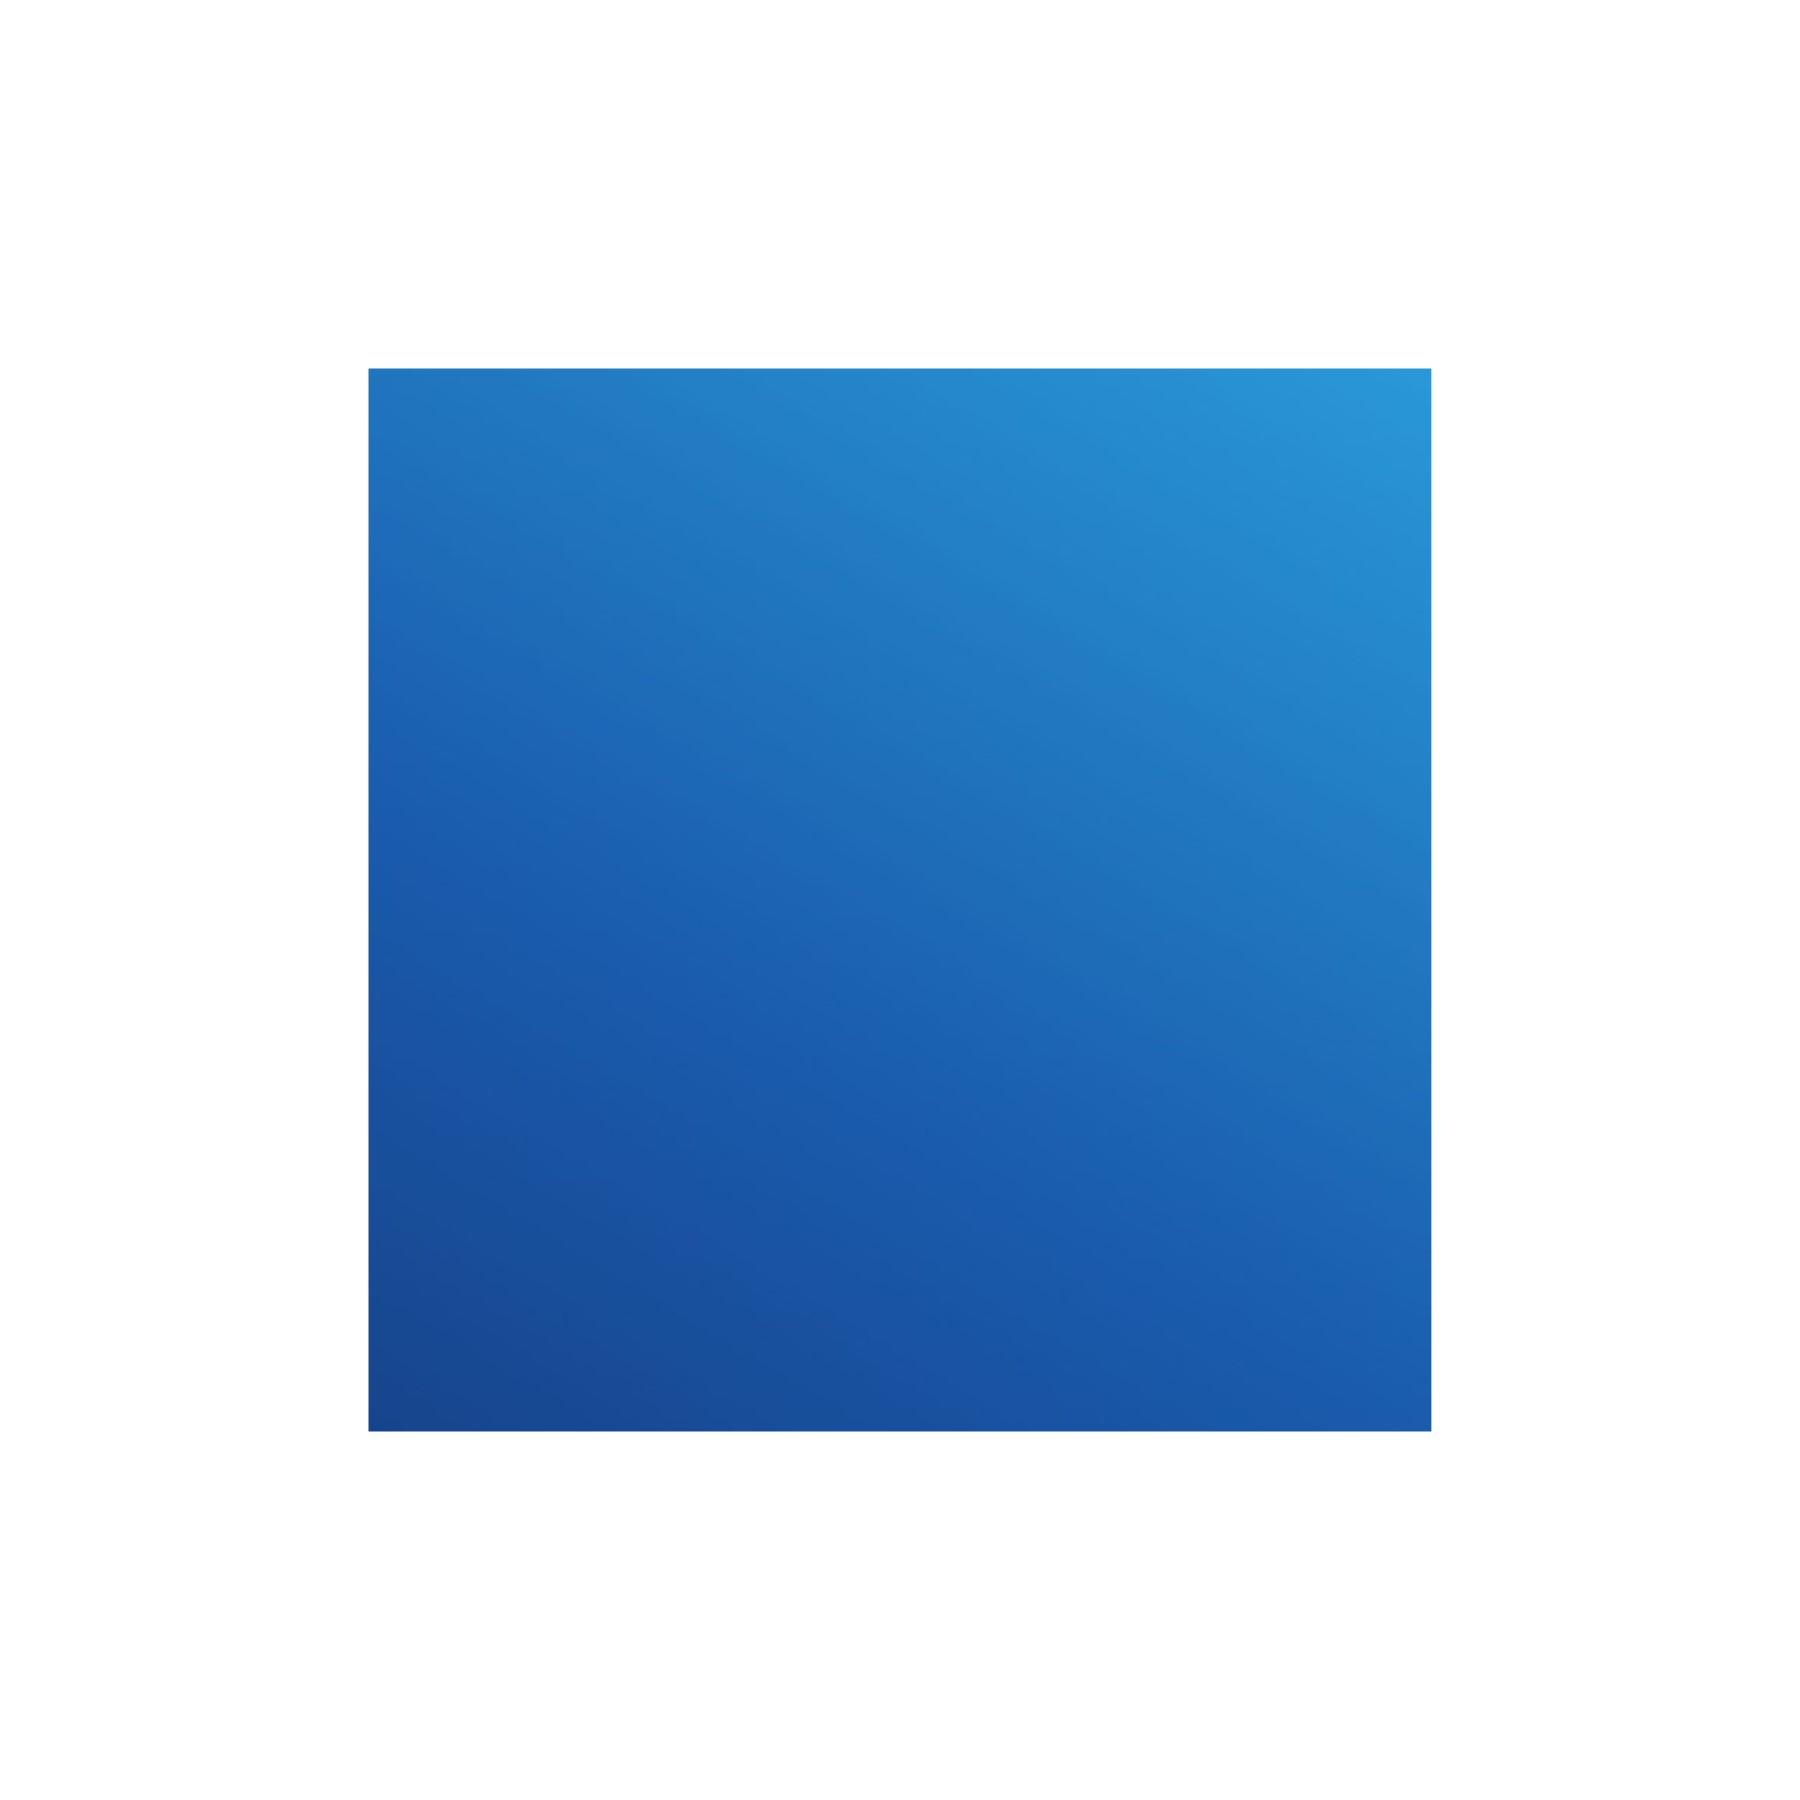 Vinilo textil Easyweed® Electric hoja 30 x 38 cm Azul